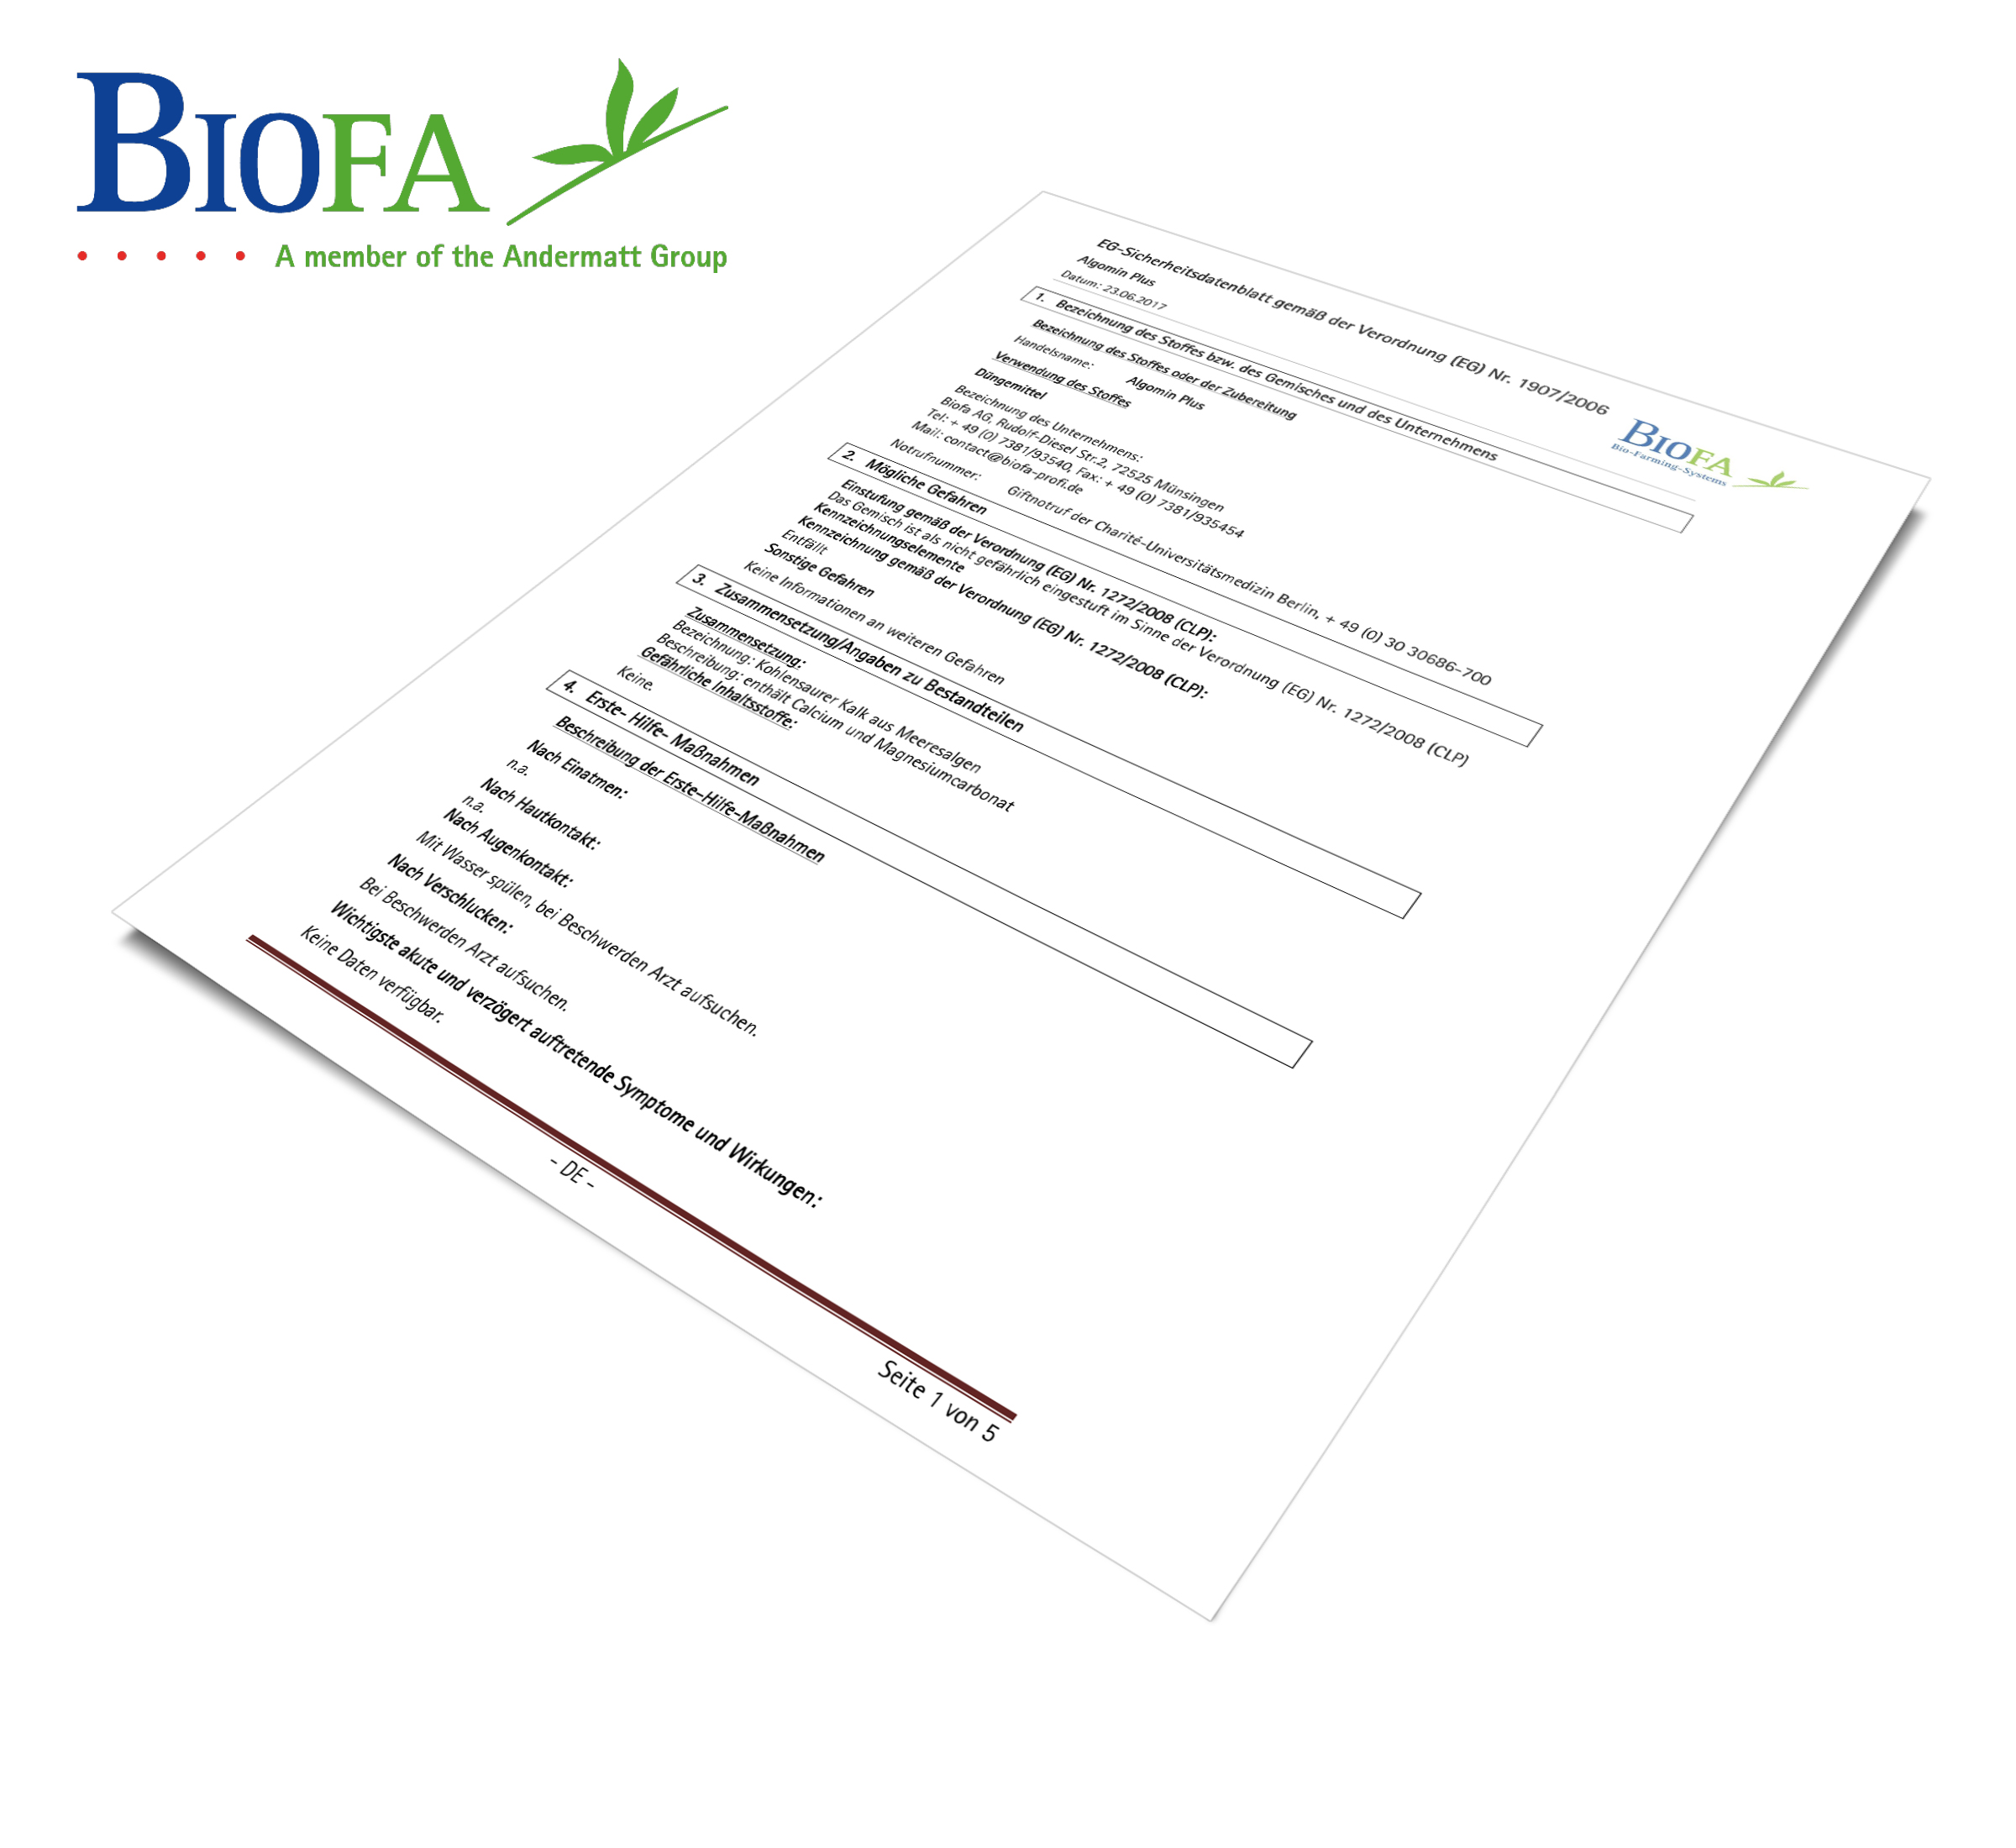 BIOFA_Sicherheitsbaltt_2021